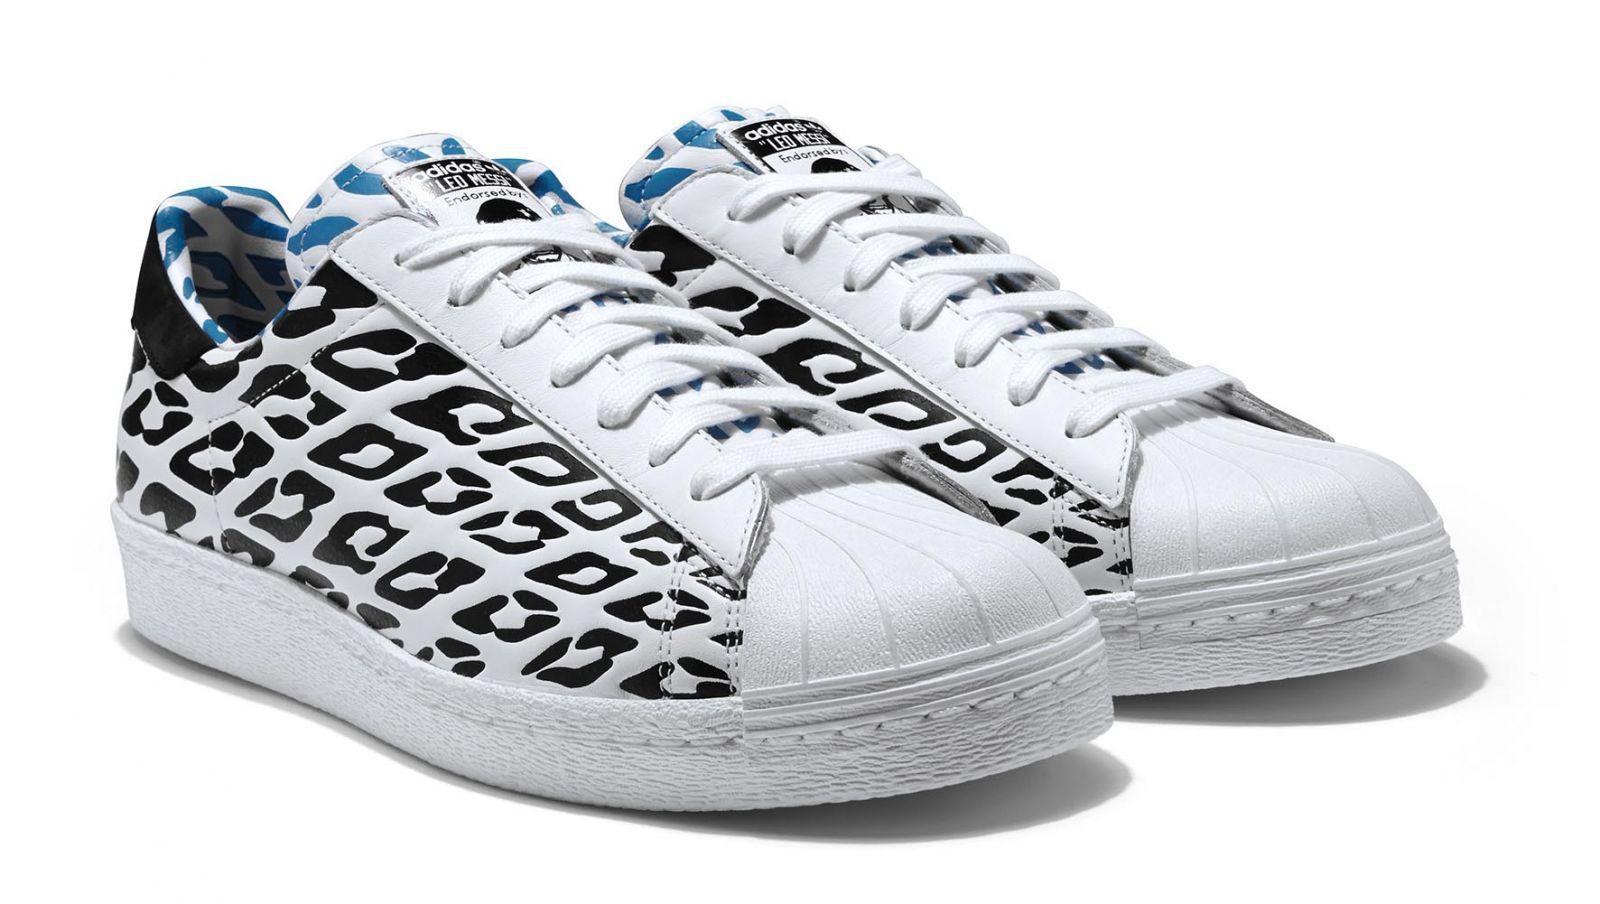 new adidas superstar 2014